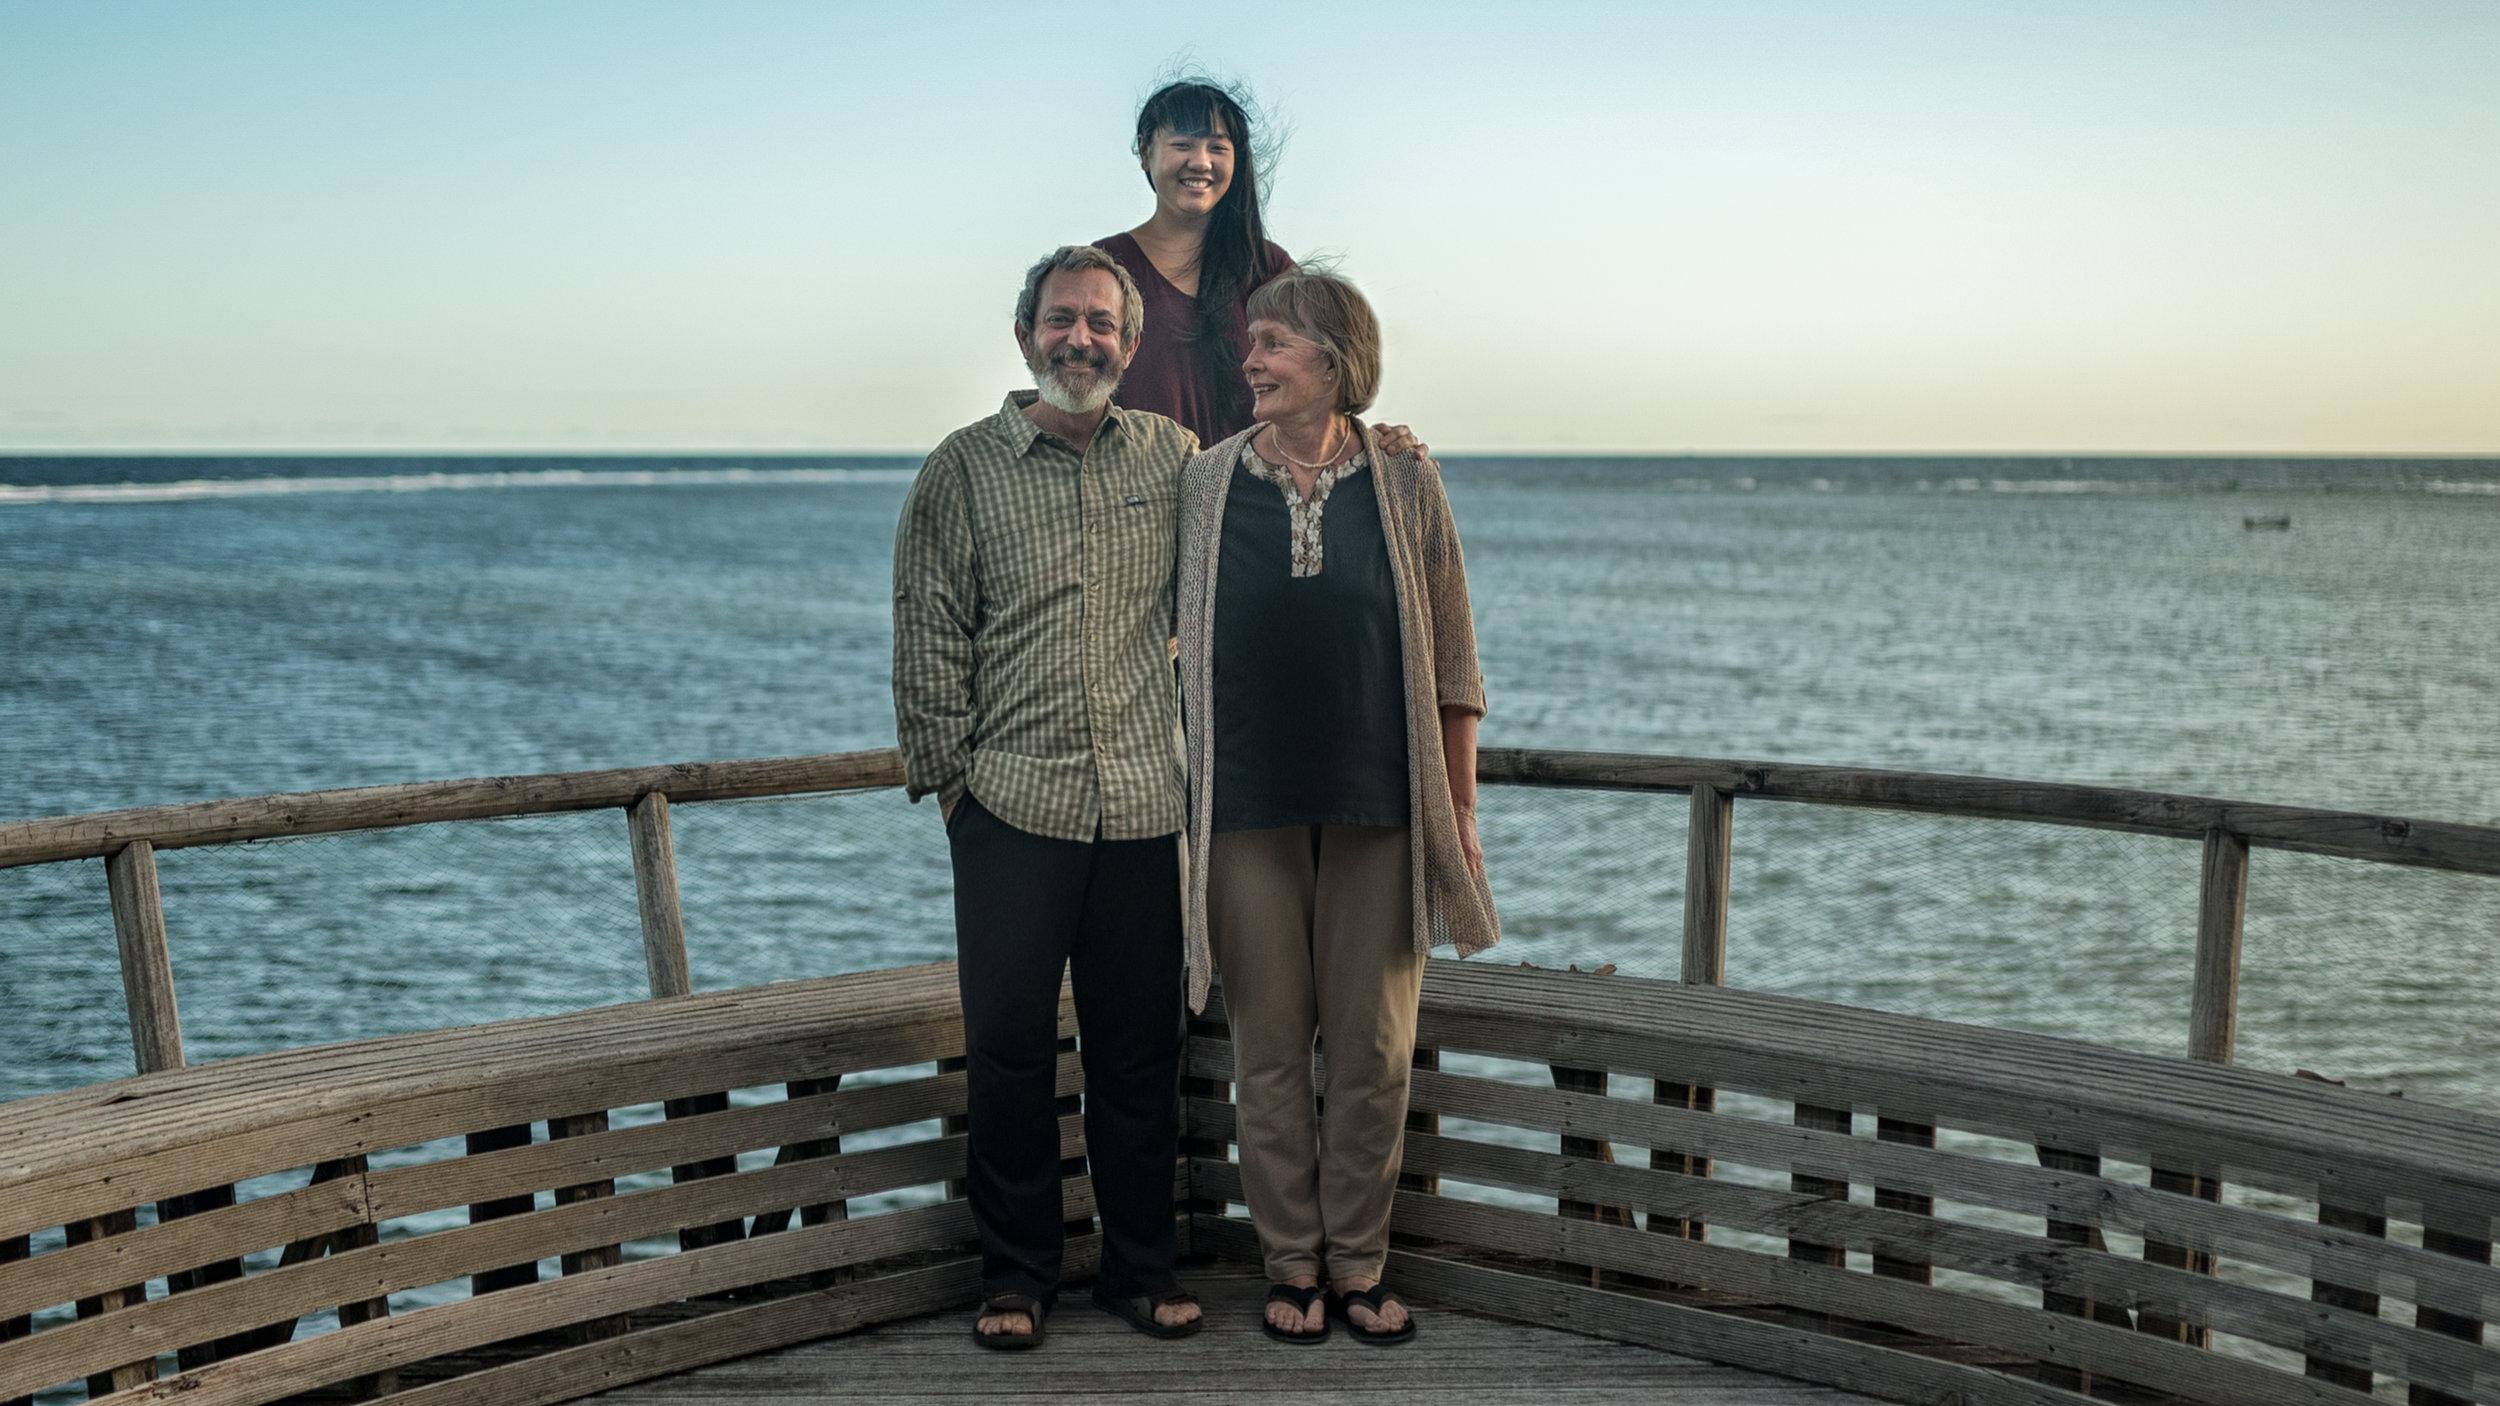 Gary Yost and Family in Fiji